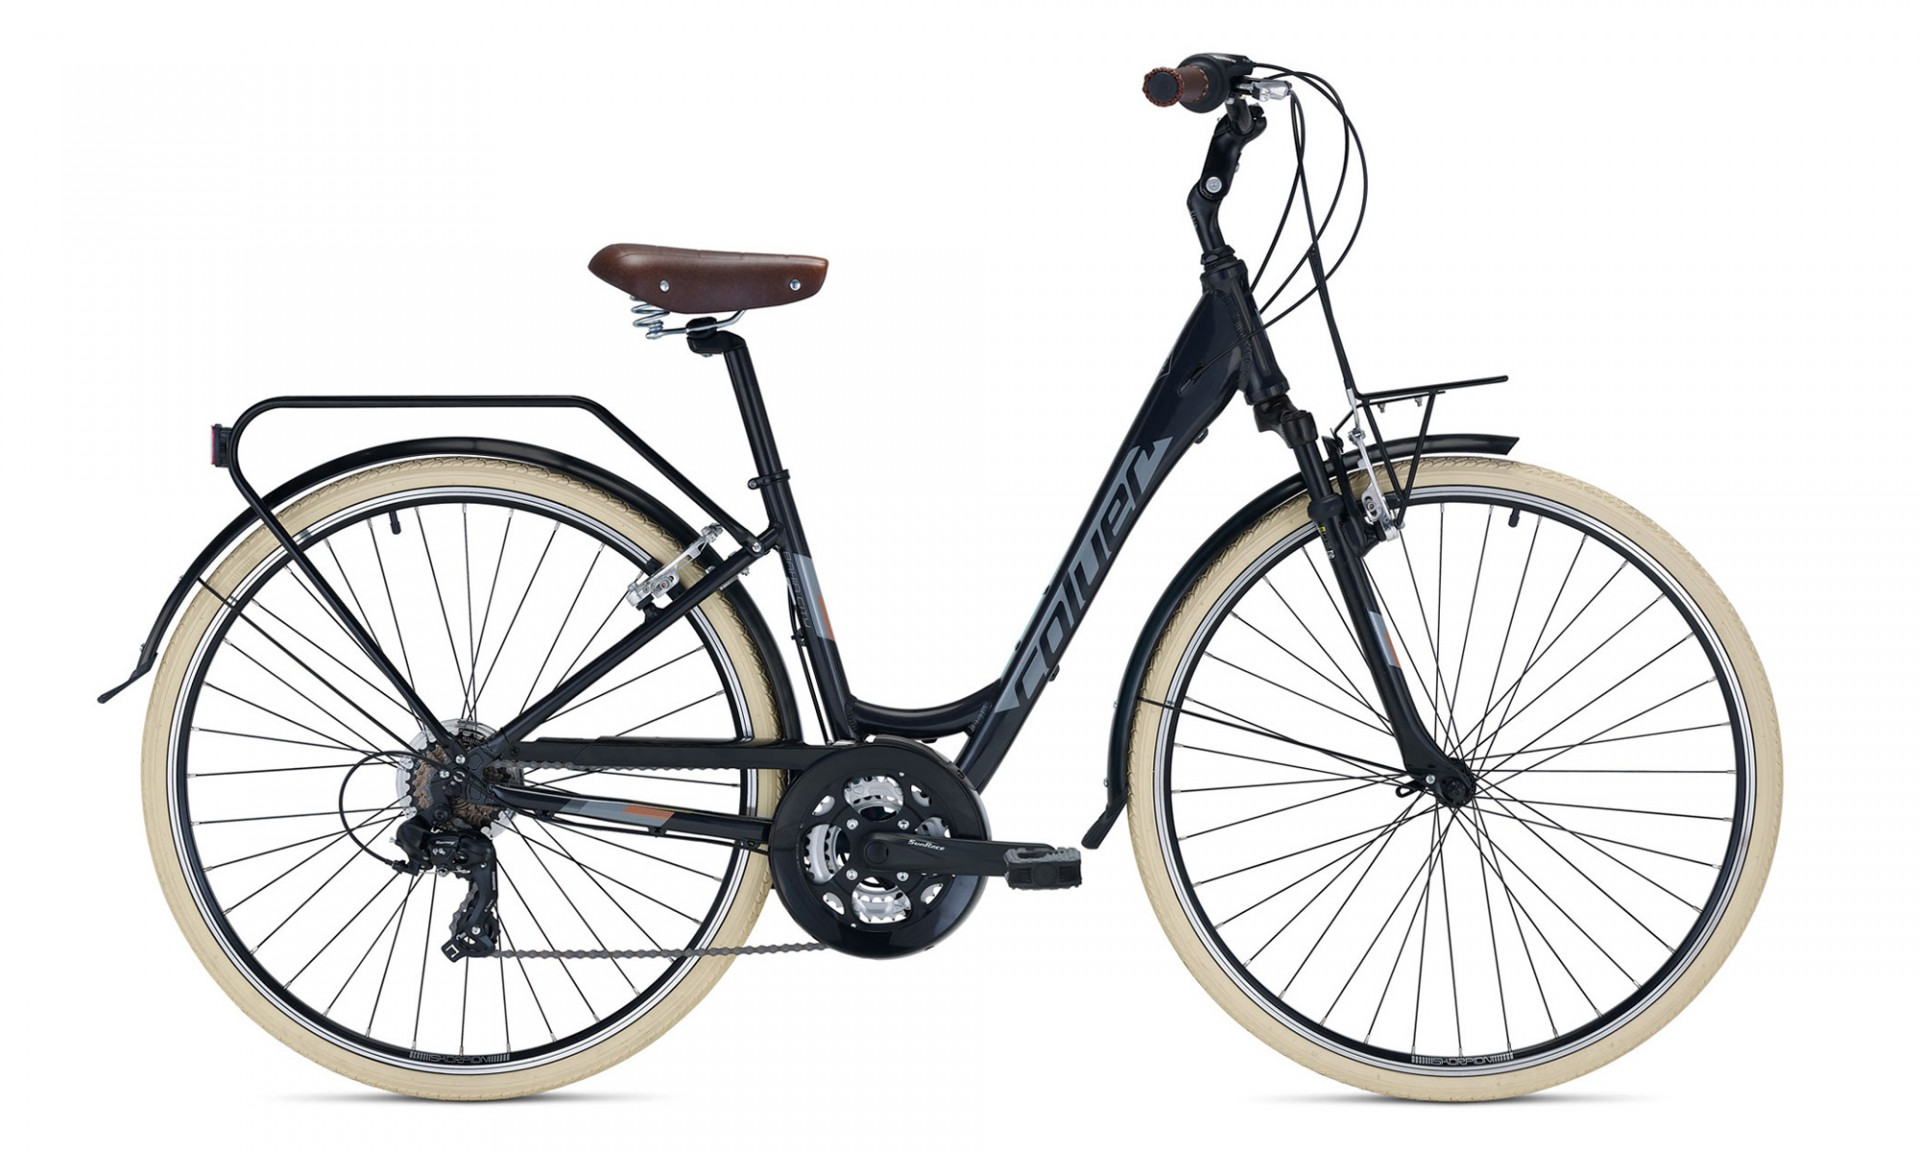 Bicicleta Coluer Bahia 721 (28'') / 207 (26'')